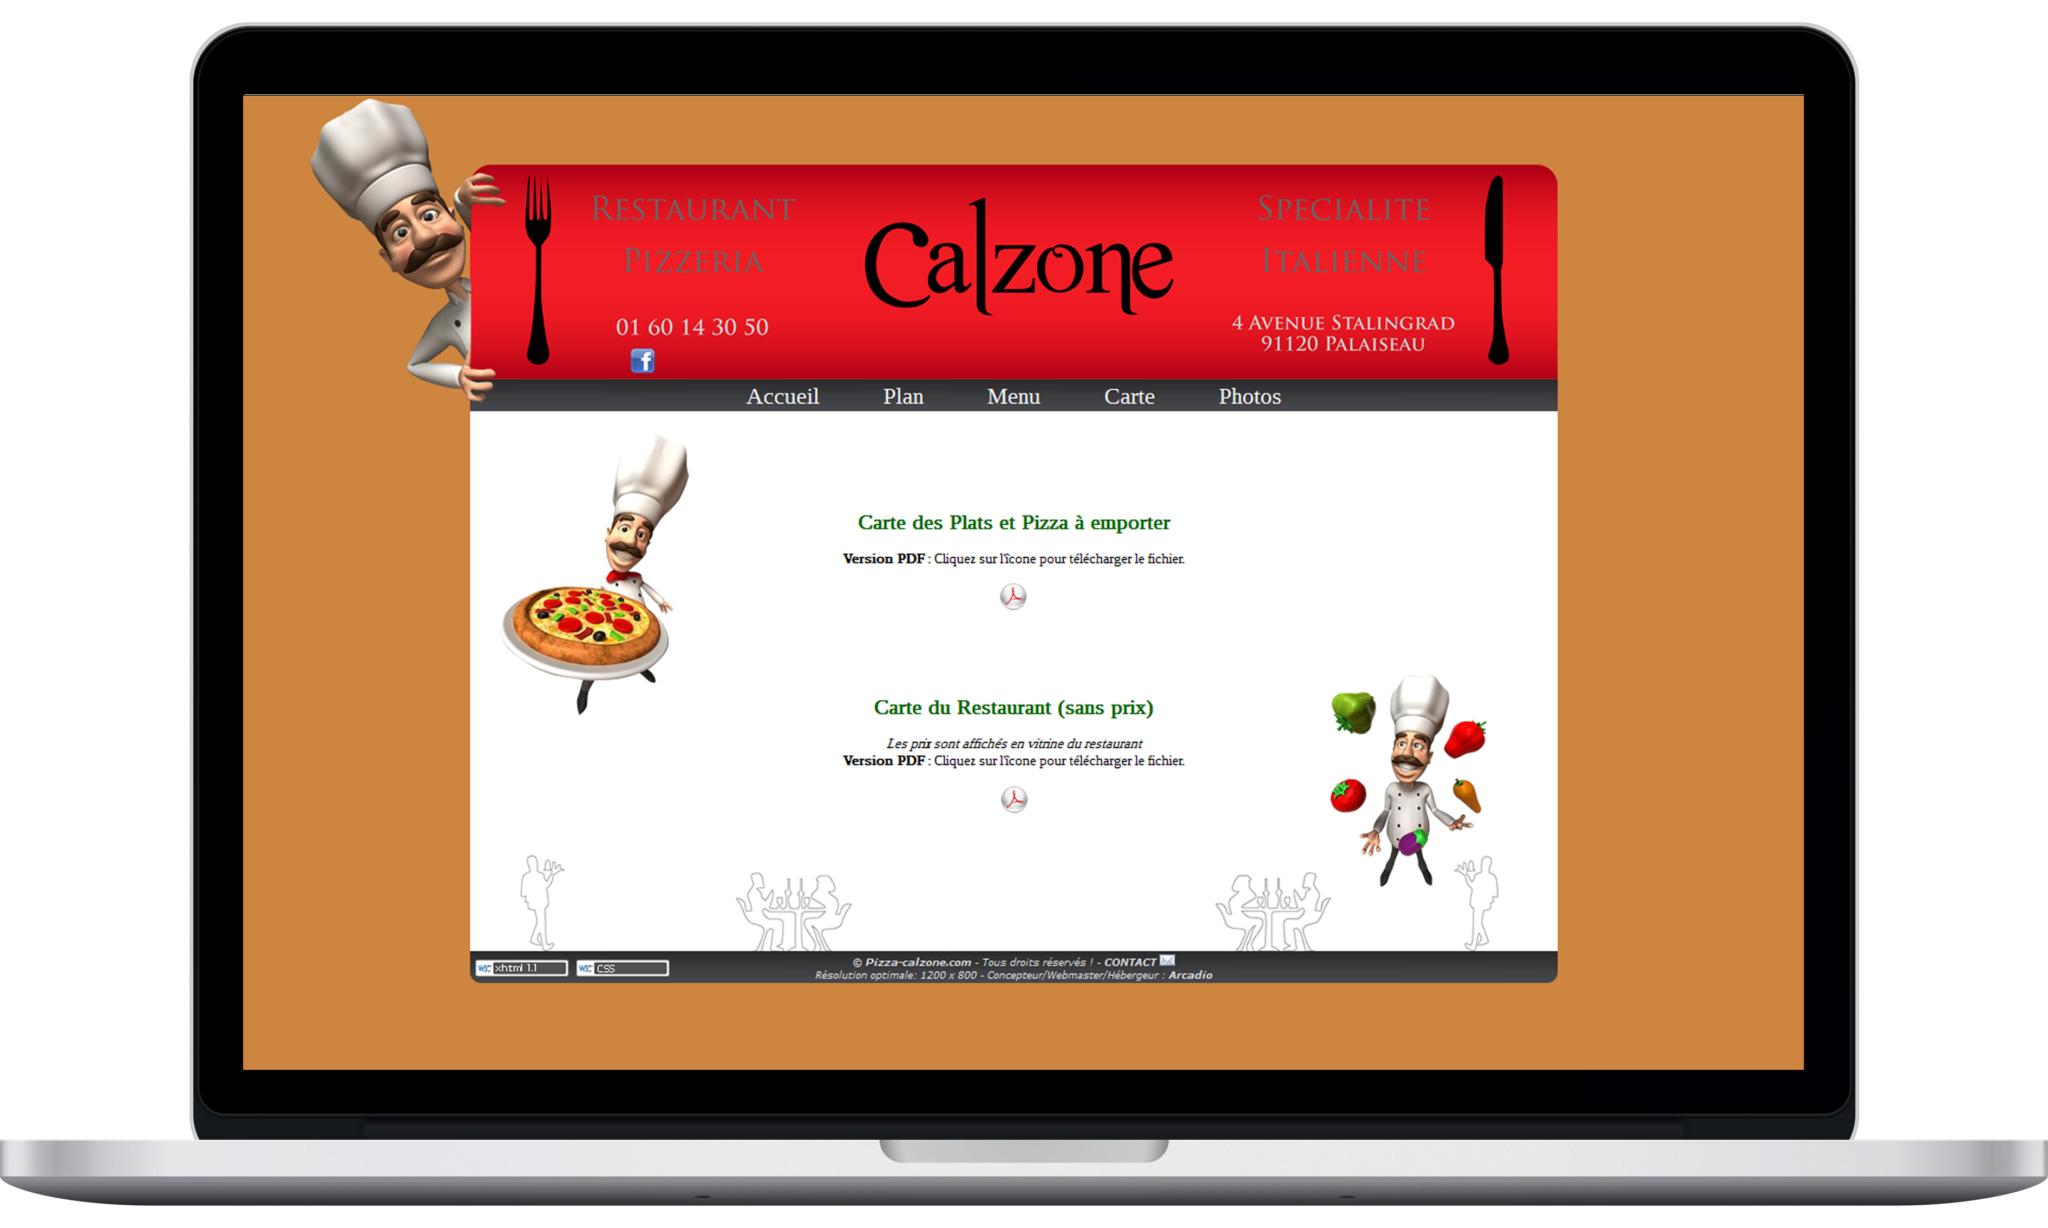 Restaurant Calzone de Palaiseau